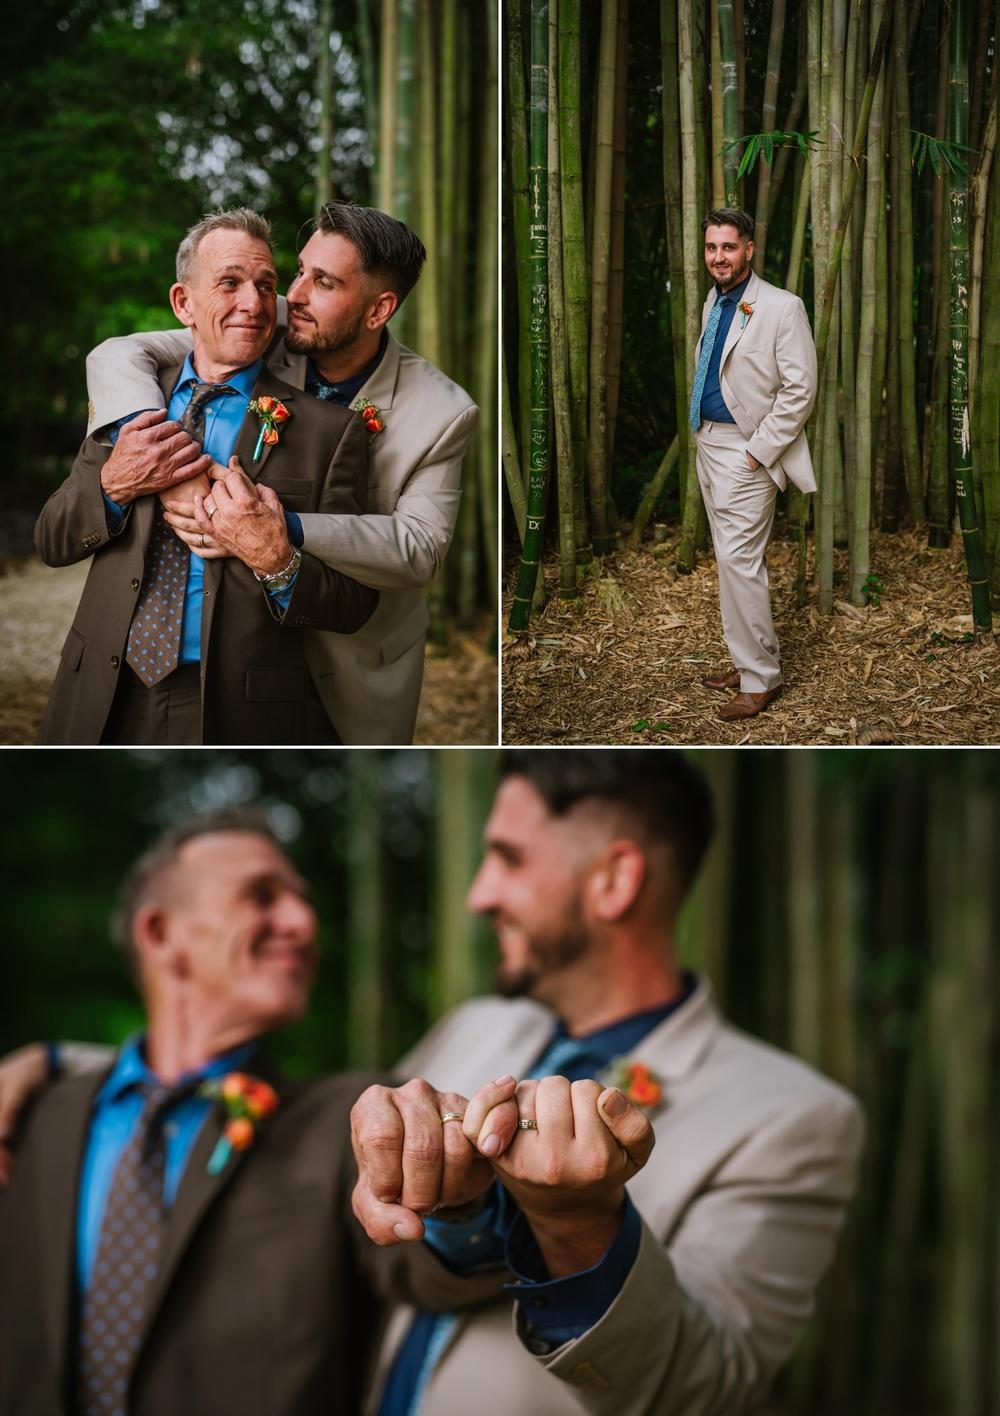 tampa-wedding-photographer-ashlee-hamon-lgbt-wedding_0009.jpg